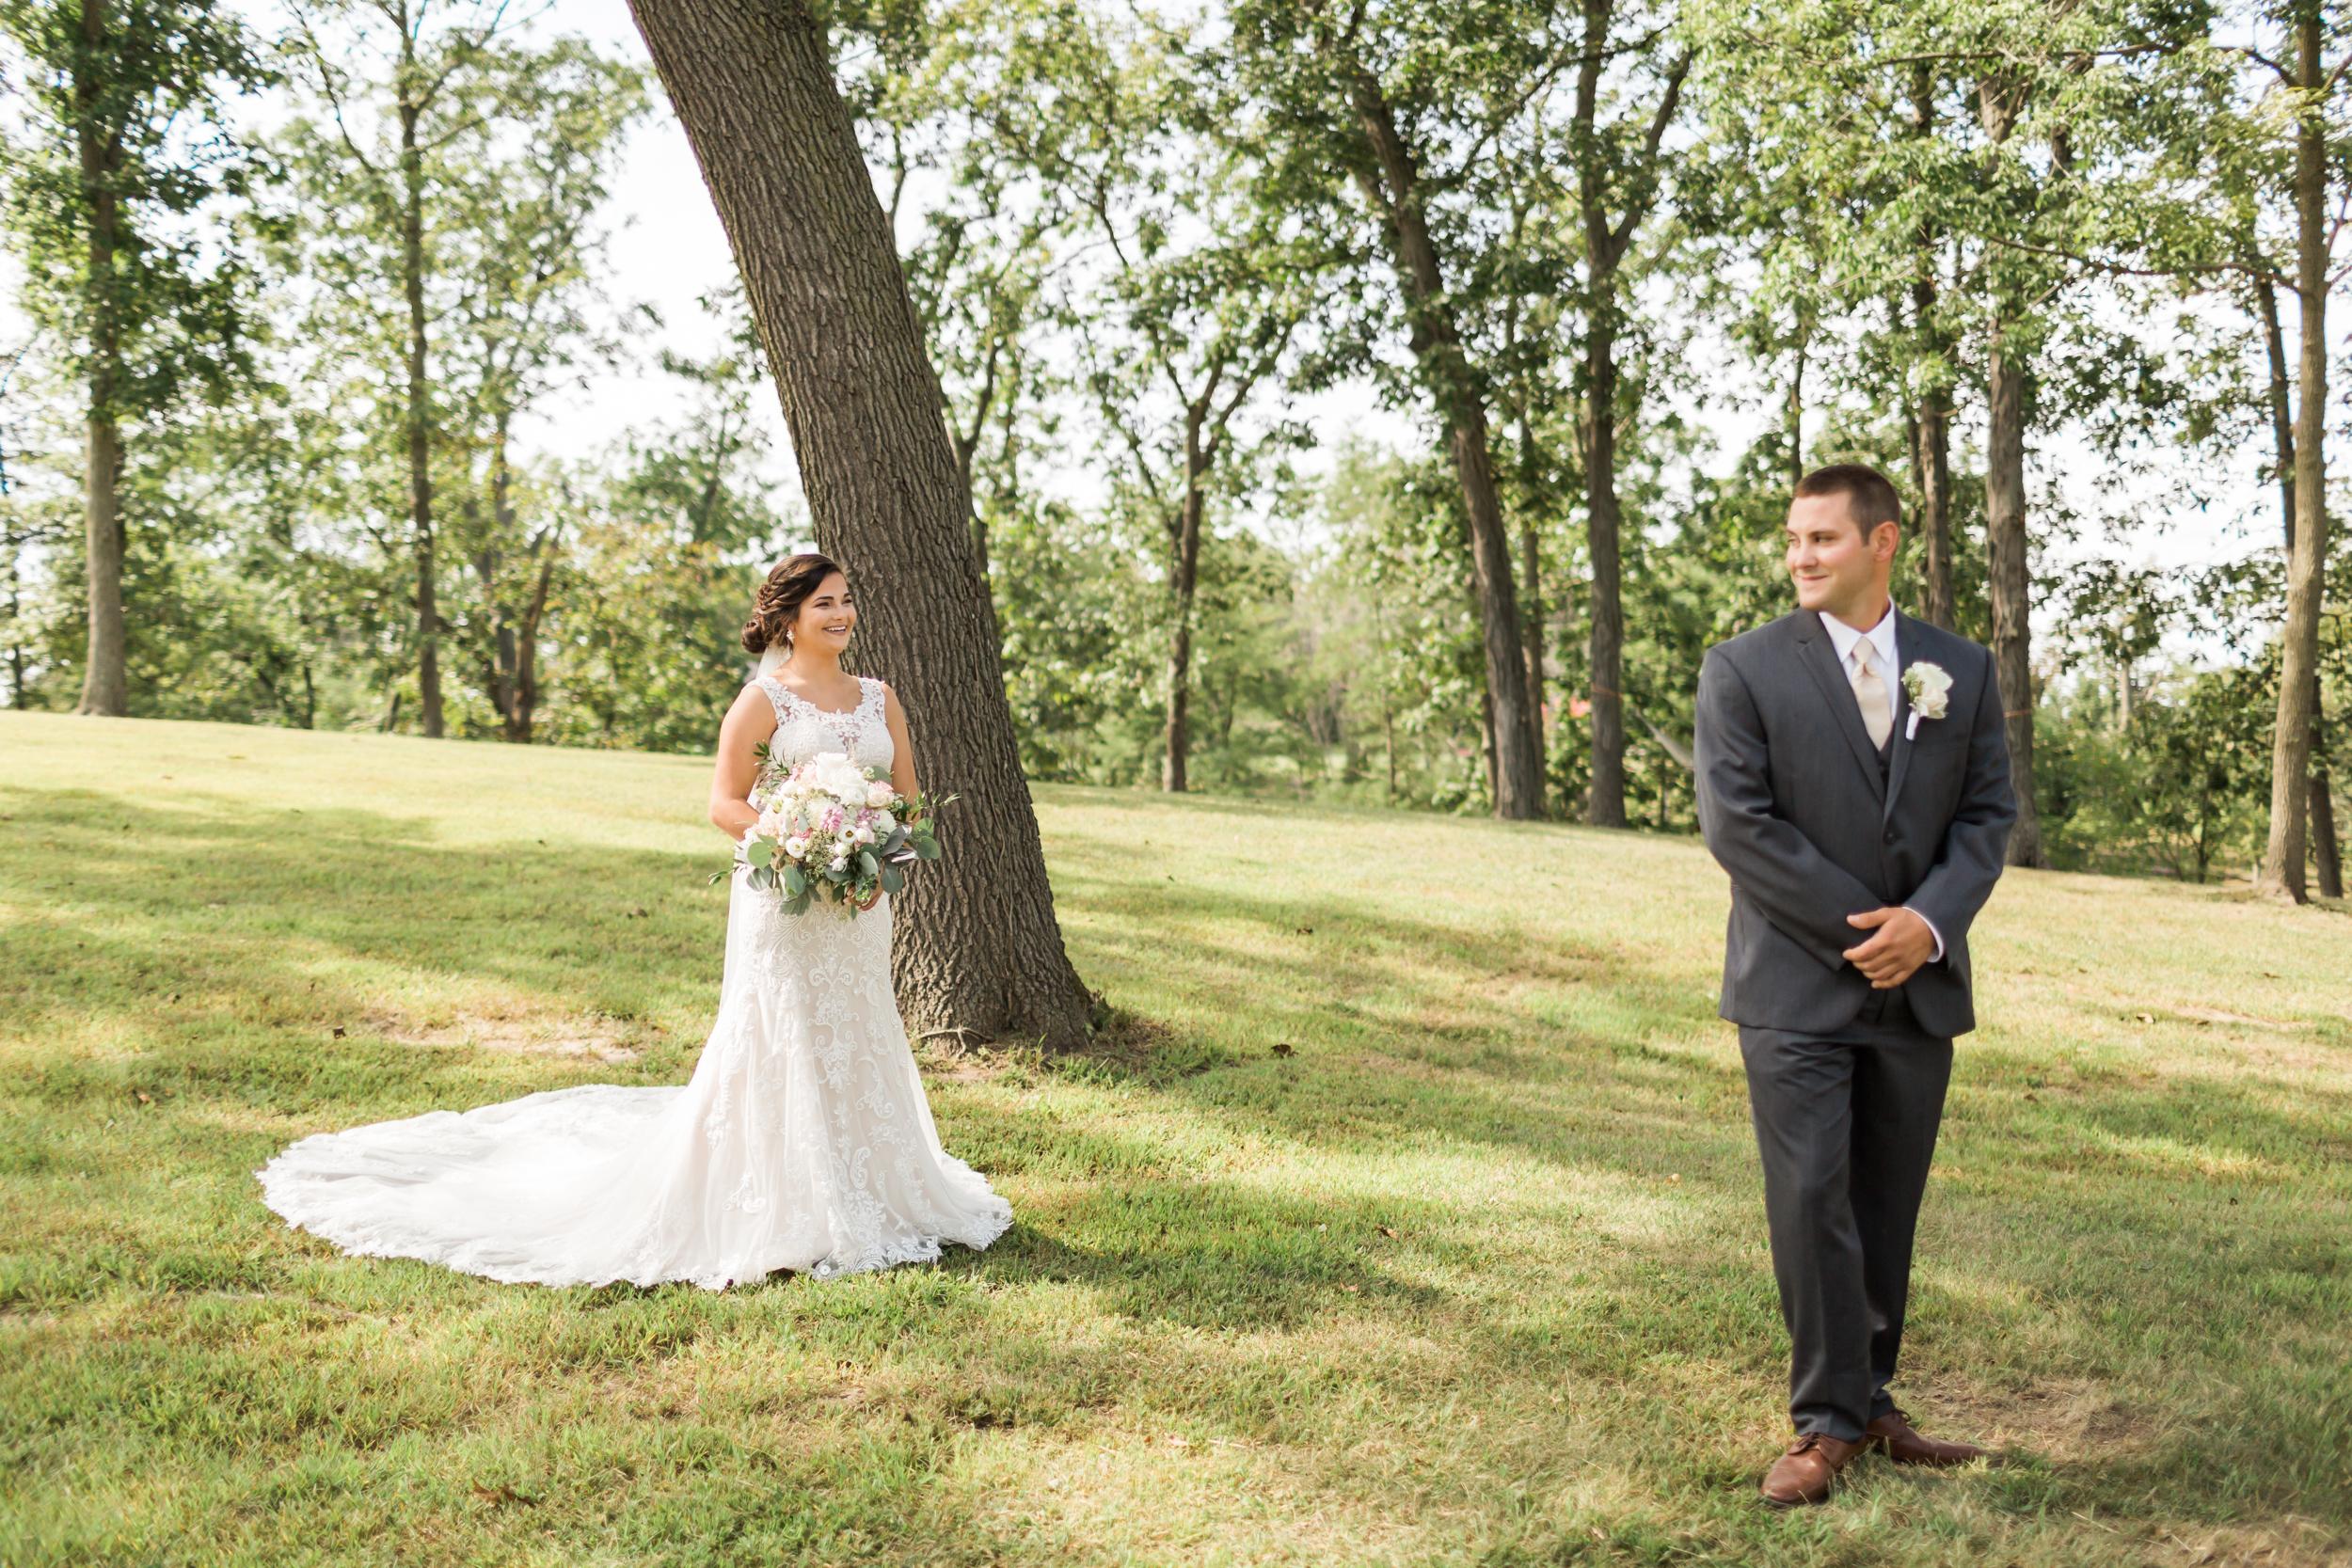 romanticcountrywedding--34.jpg